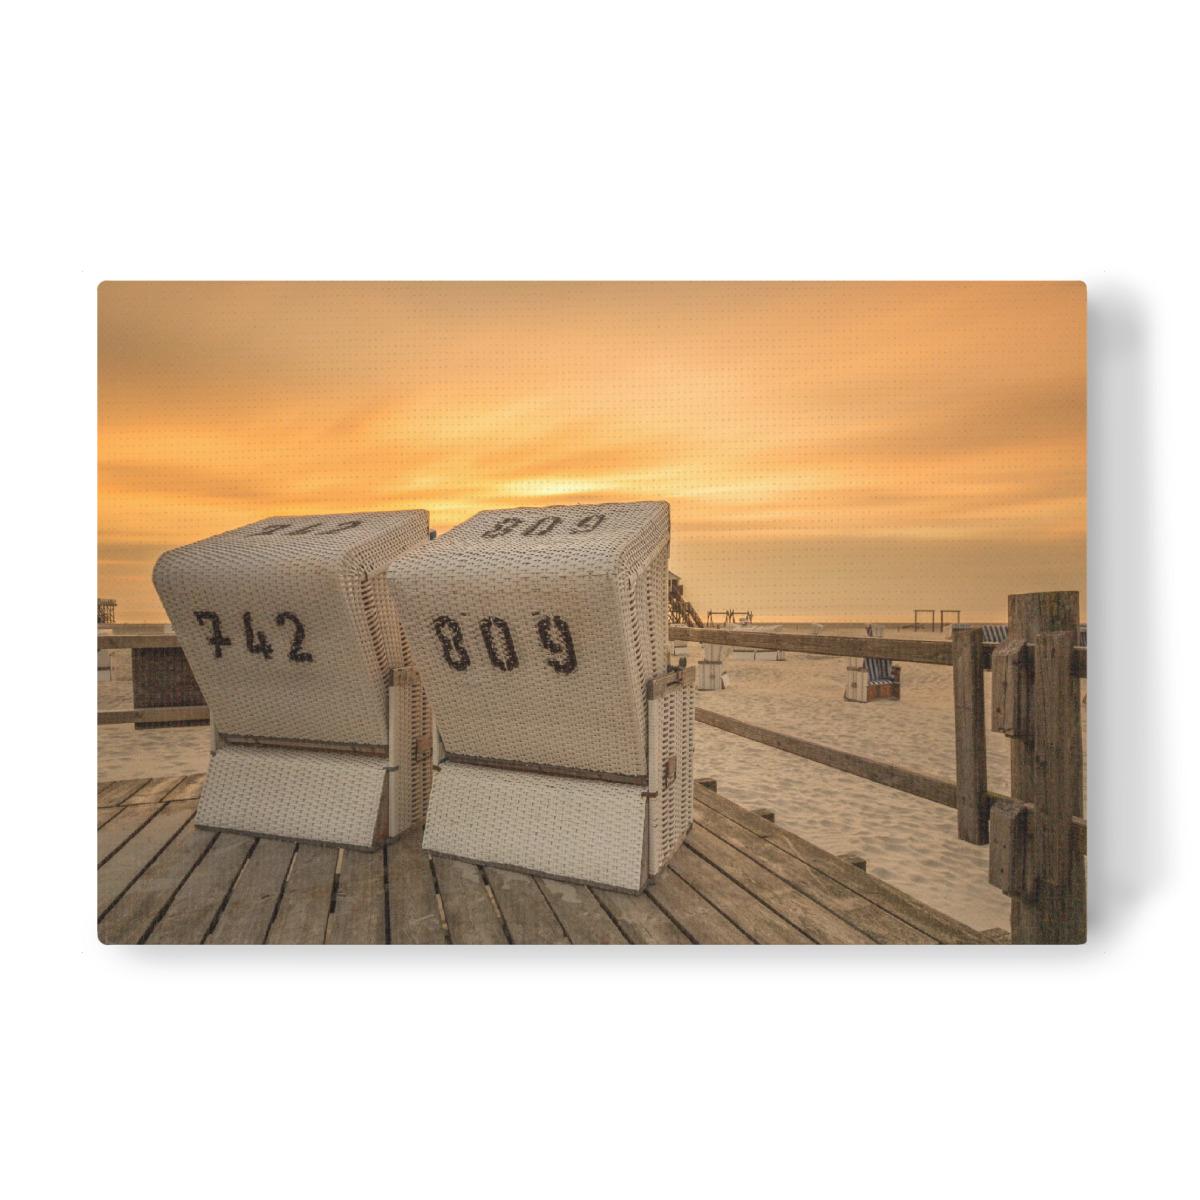 Strandkorb sonnenuntergang  Strandkorb Nordsee Sonnenuntergang als Leinwand bei artboxONE kaufen